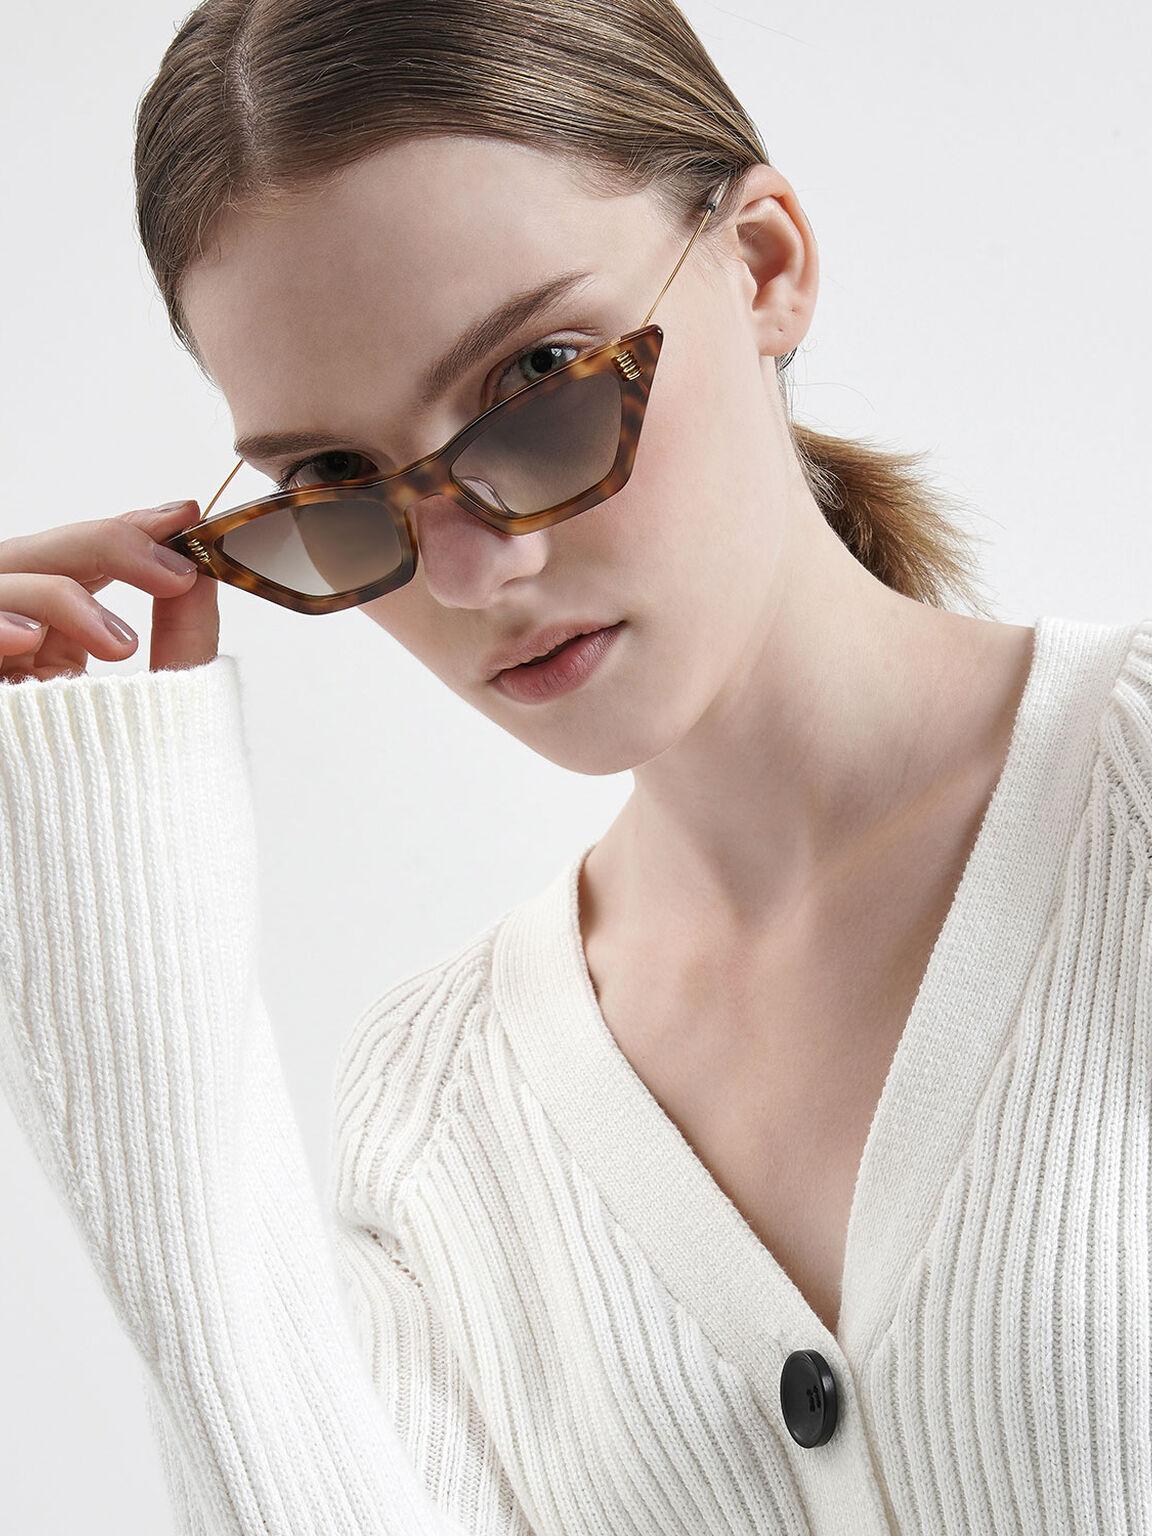 Thick Frame Tortoiseshell Cat-Eye Sunglasses, T. Shell, hi-res